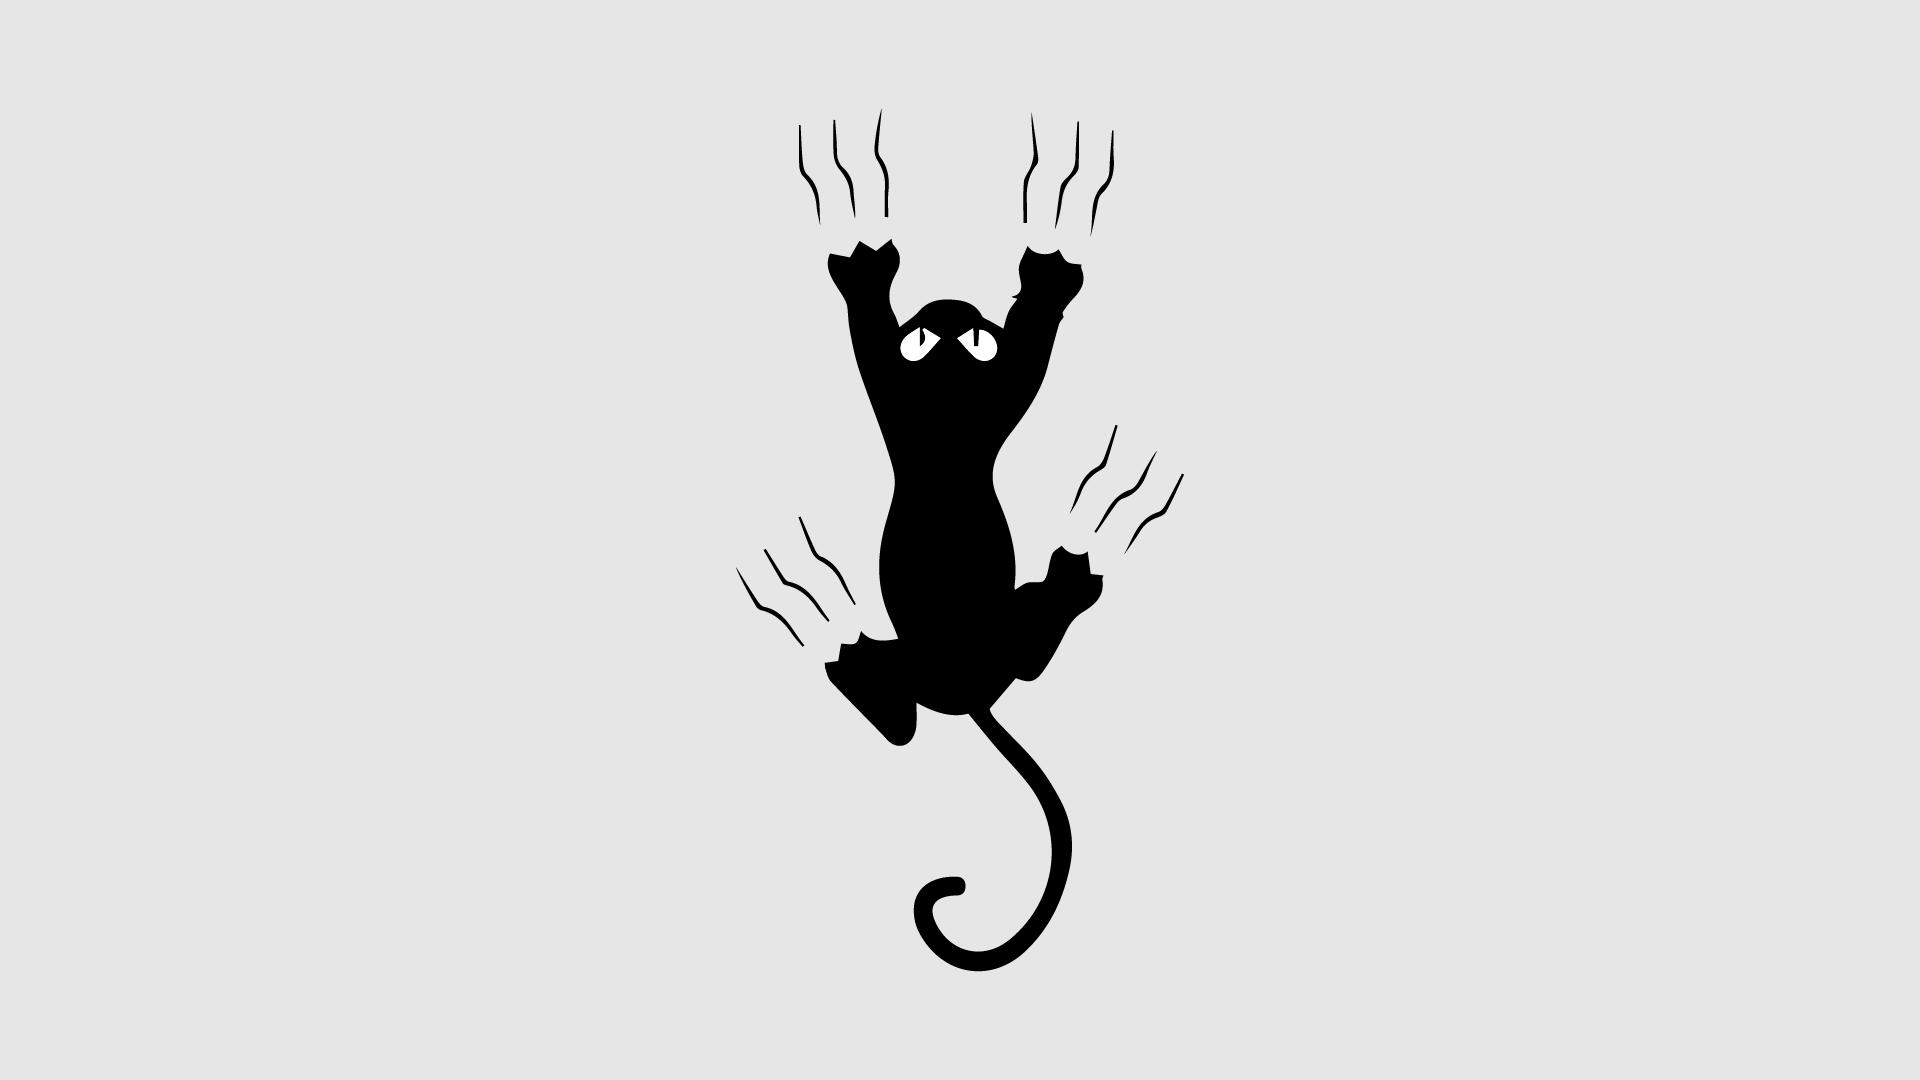 cat scratching minimalist wallpaper for macbook laptop mac desktop pc